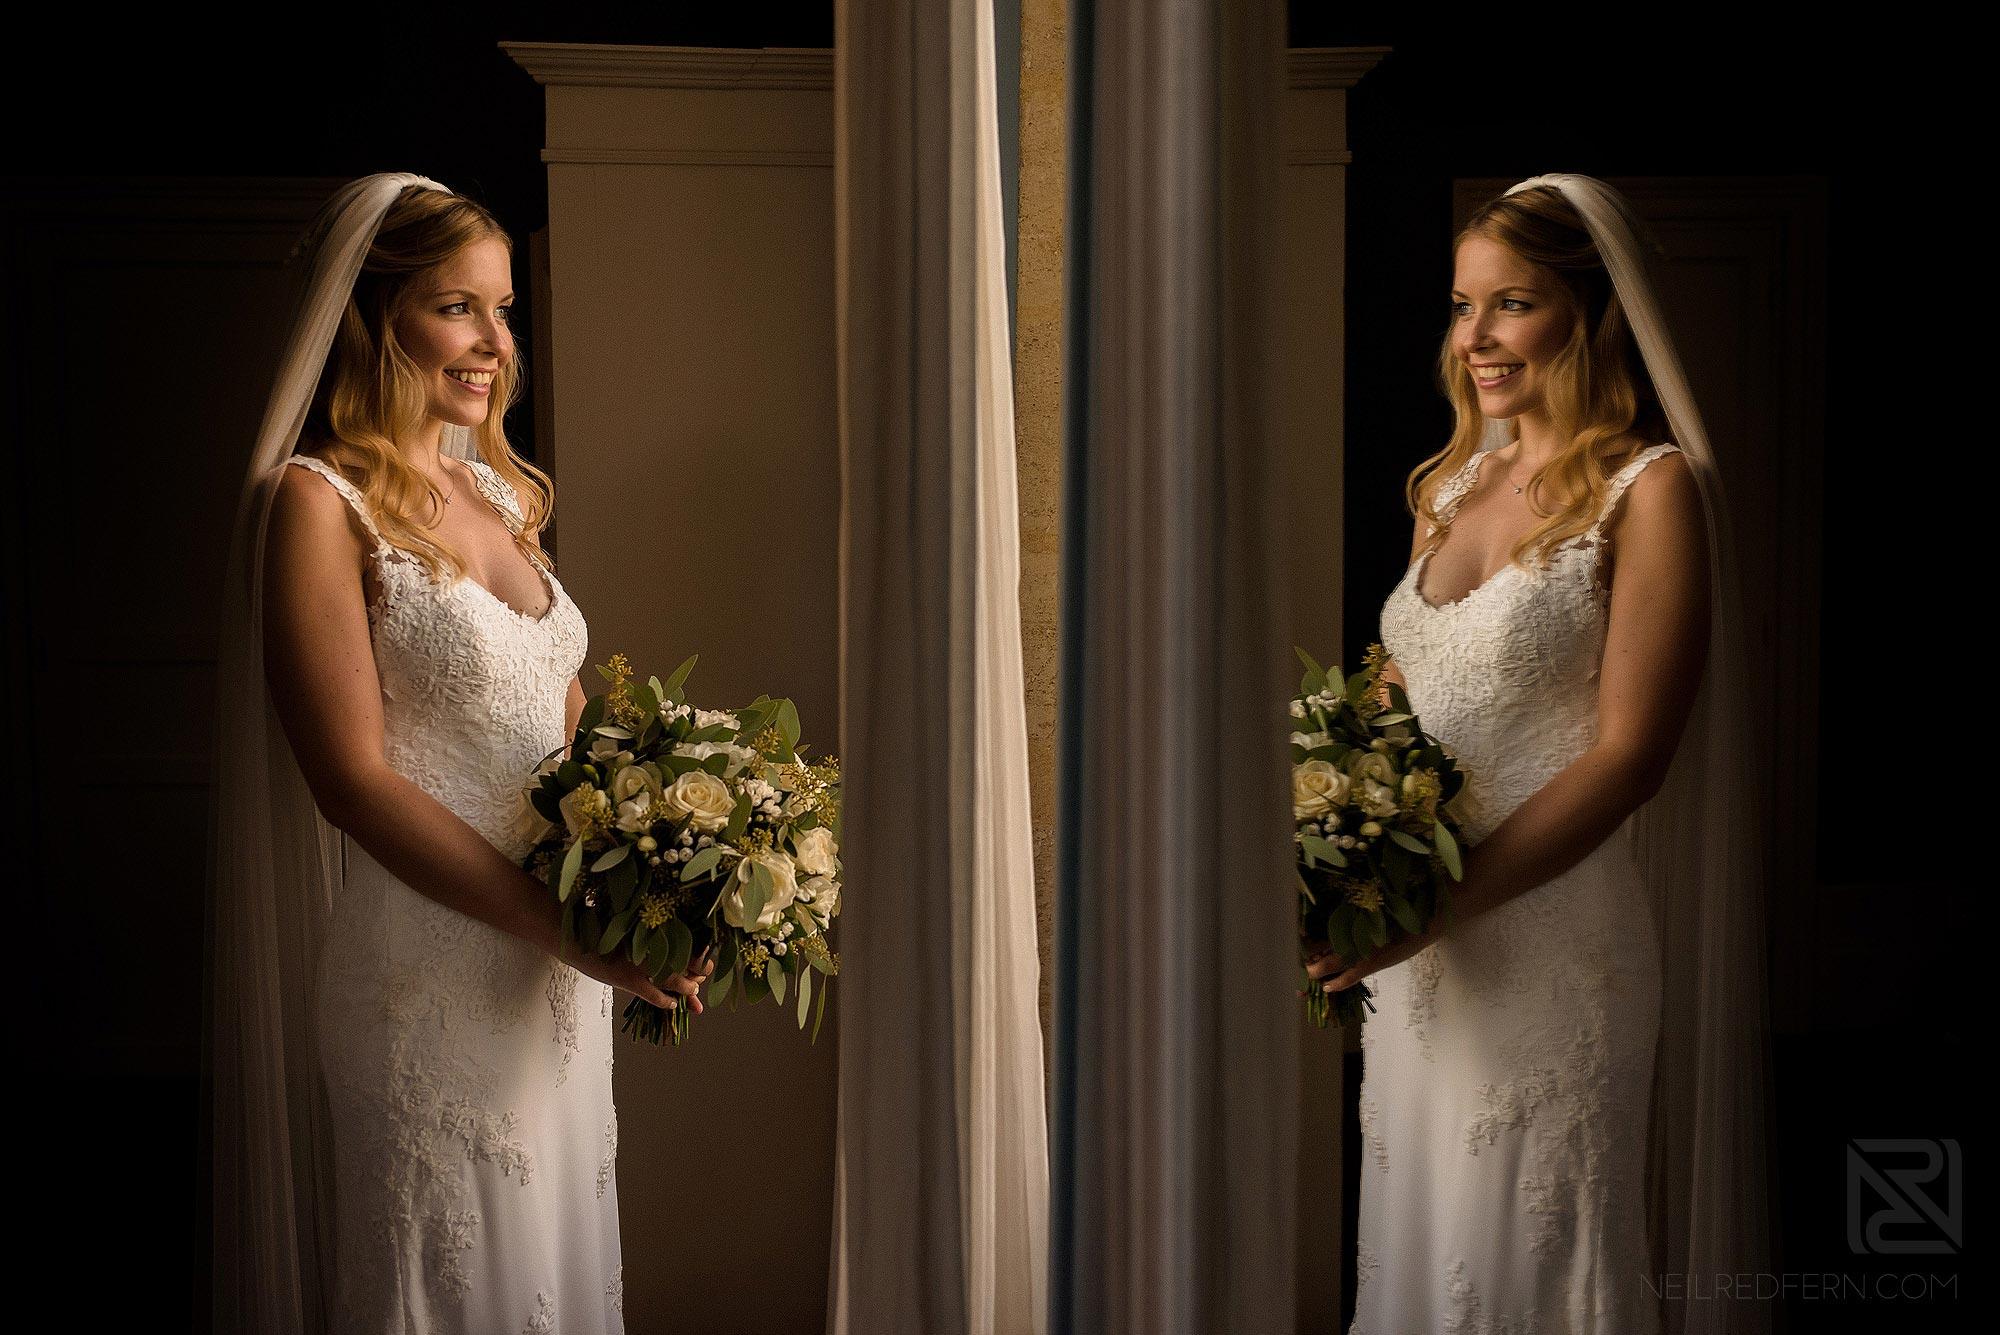 stunning portrait of bride just before wedding service